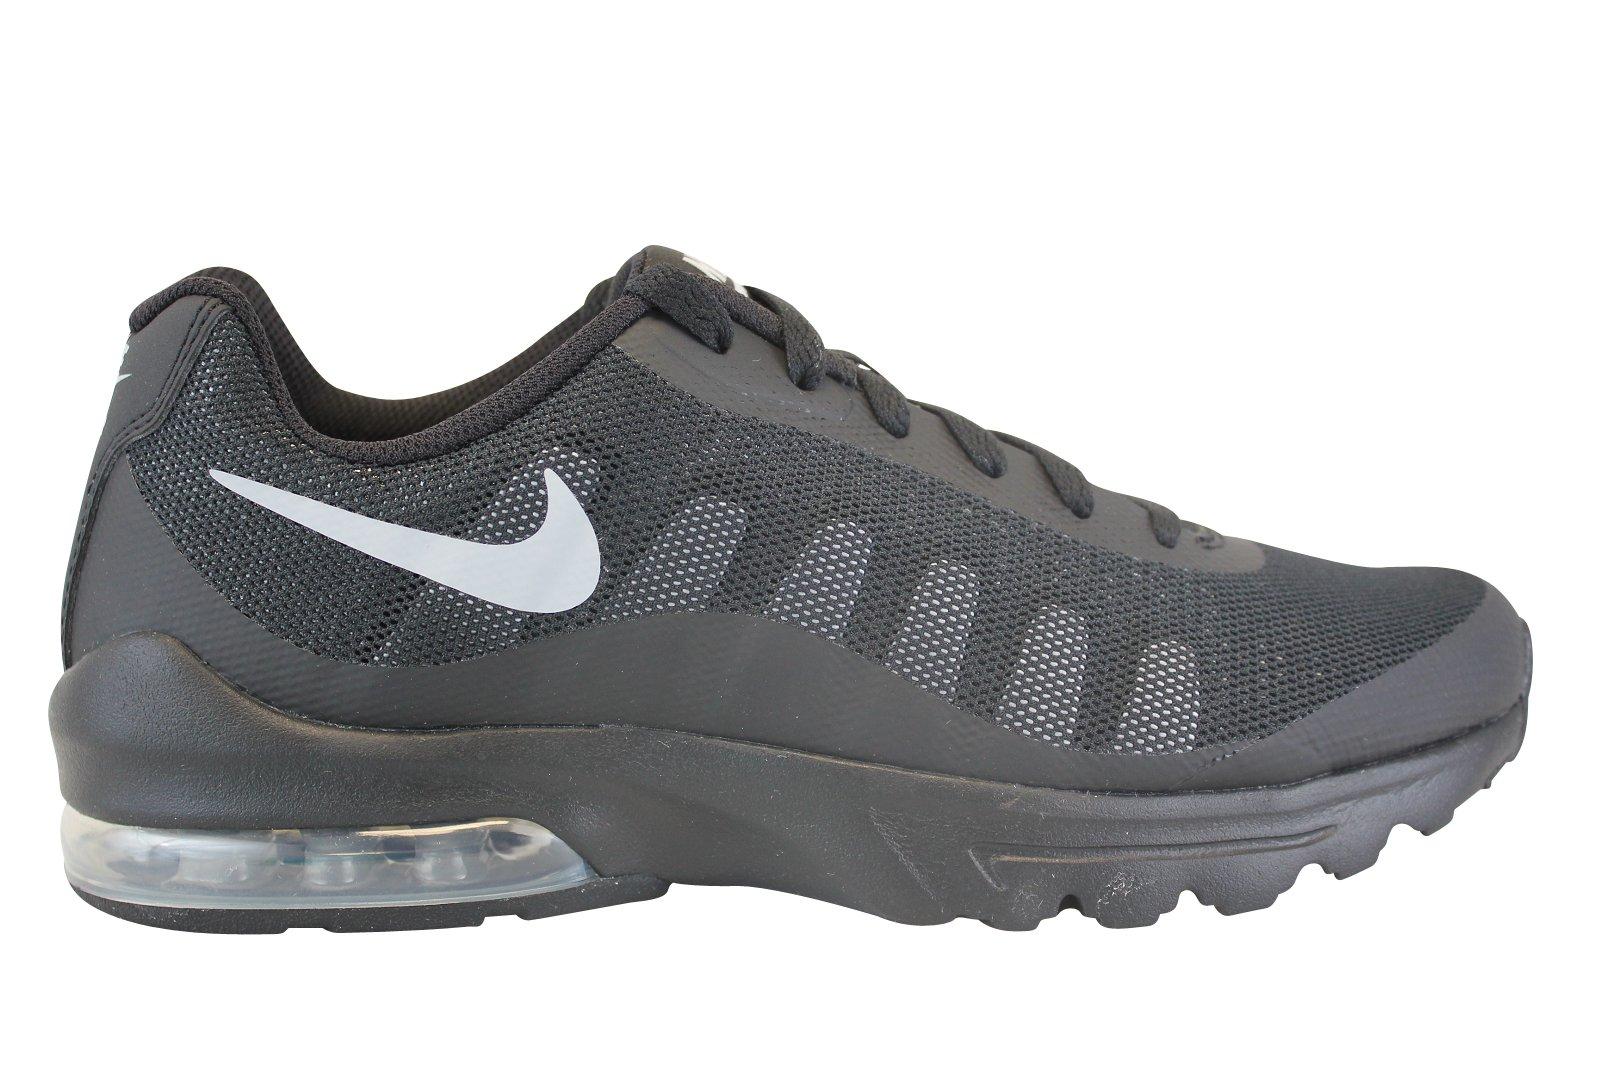 separation shoes d4448 4f706 air max invigor pas cher